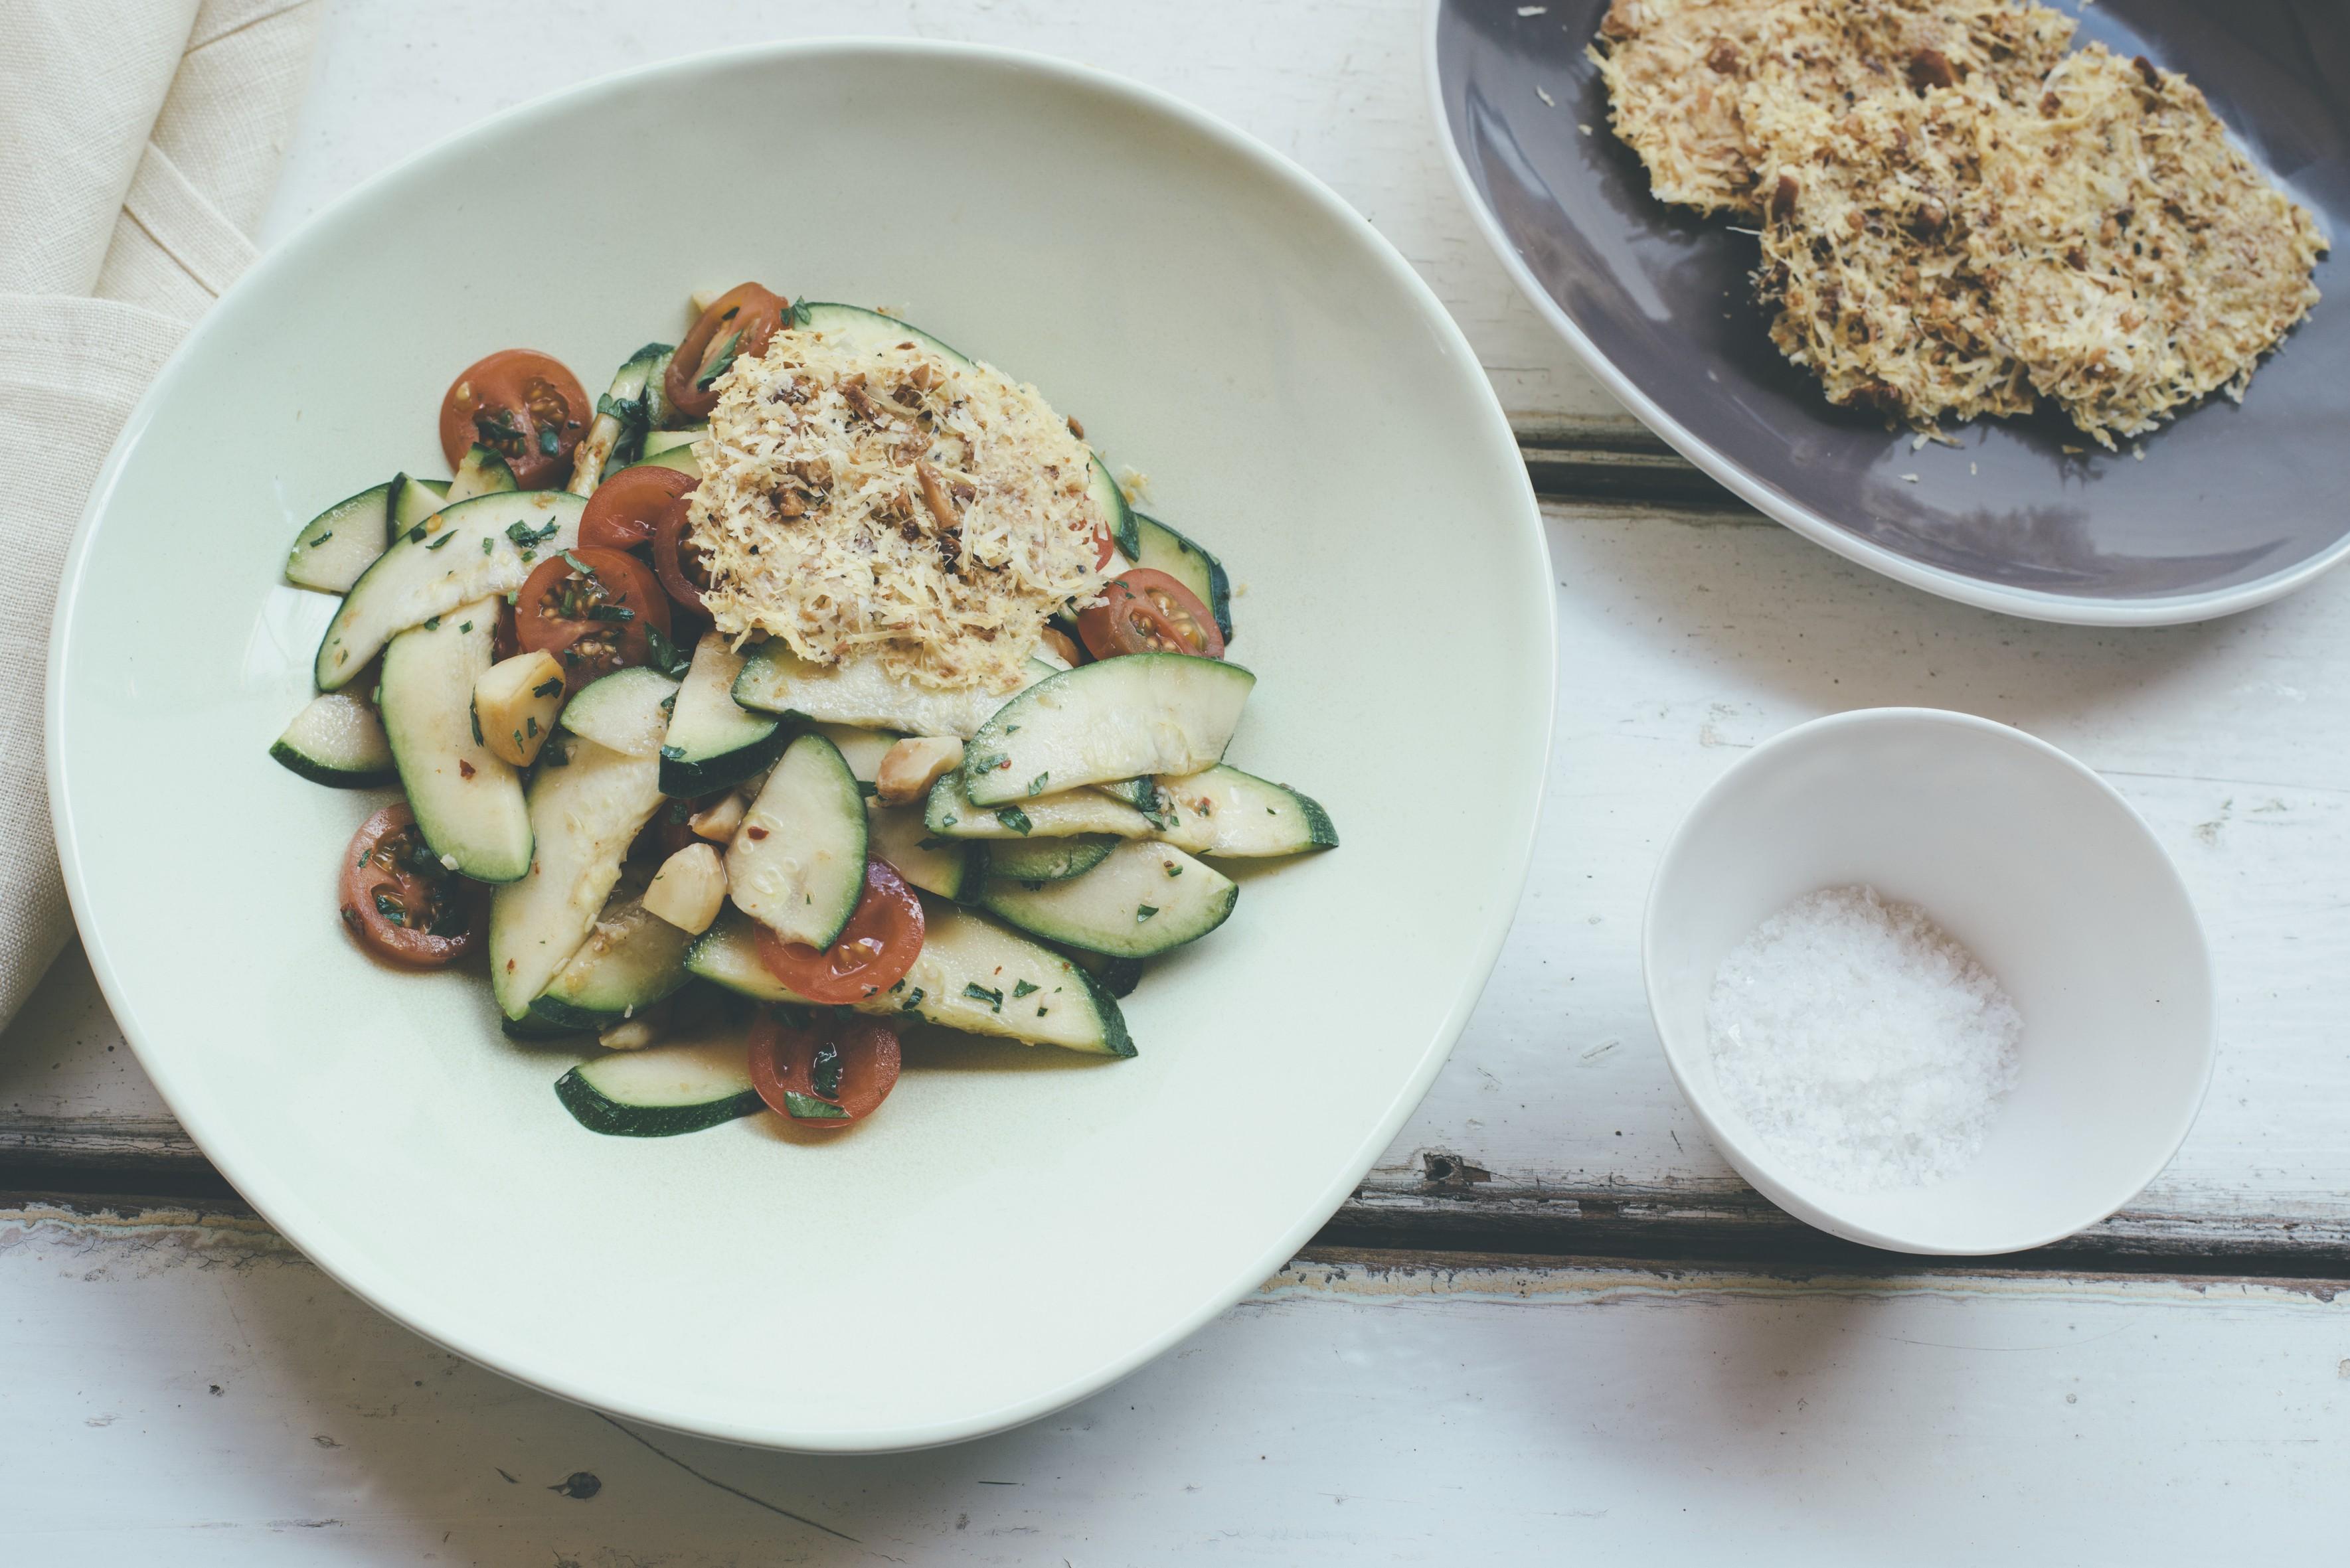 Zucchini-Tomaten-Macadamia Salat mit Parmesanhippen